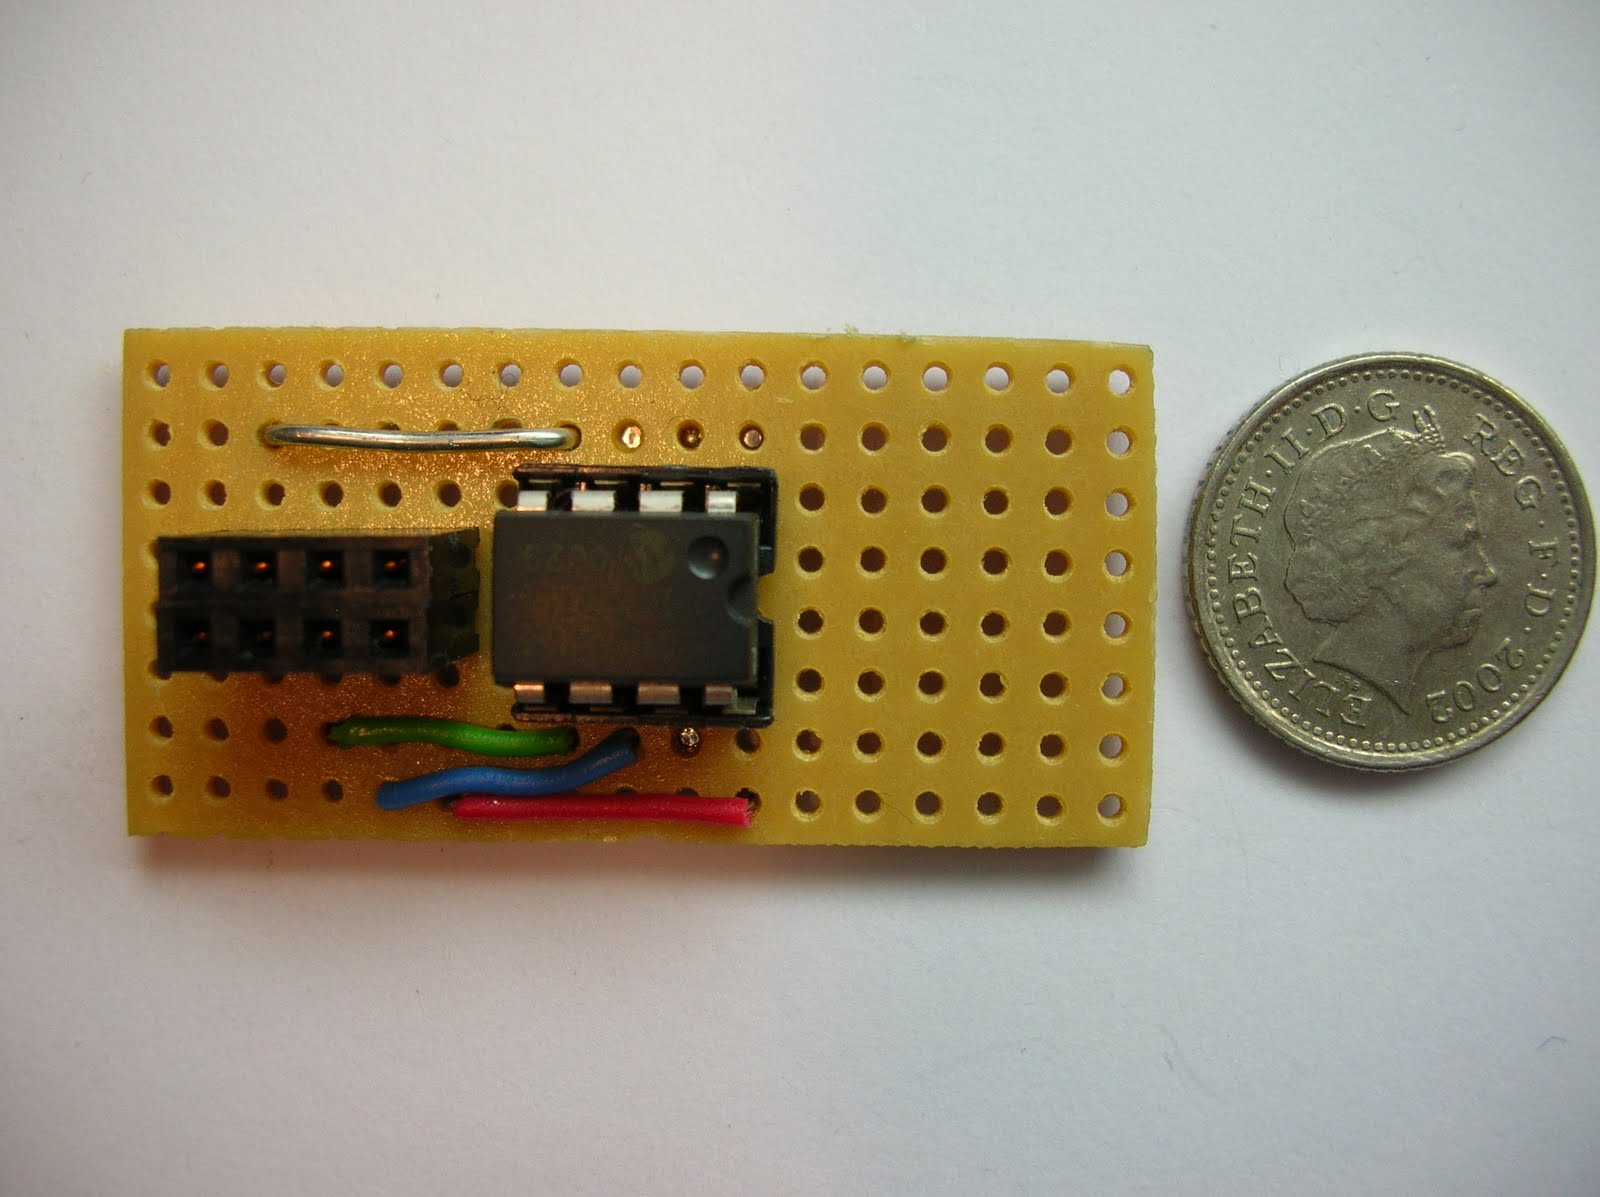 RAREblog: Arduino I2C Data Logging Board